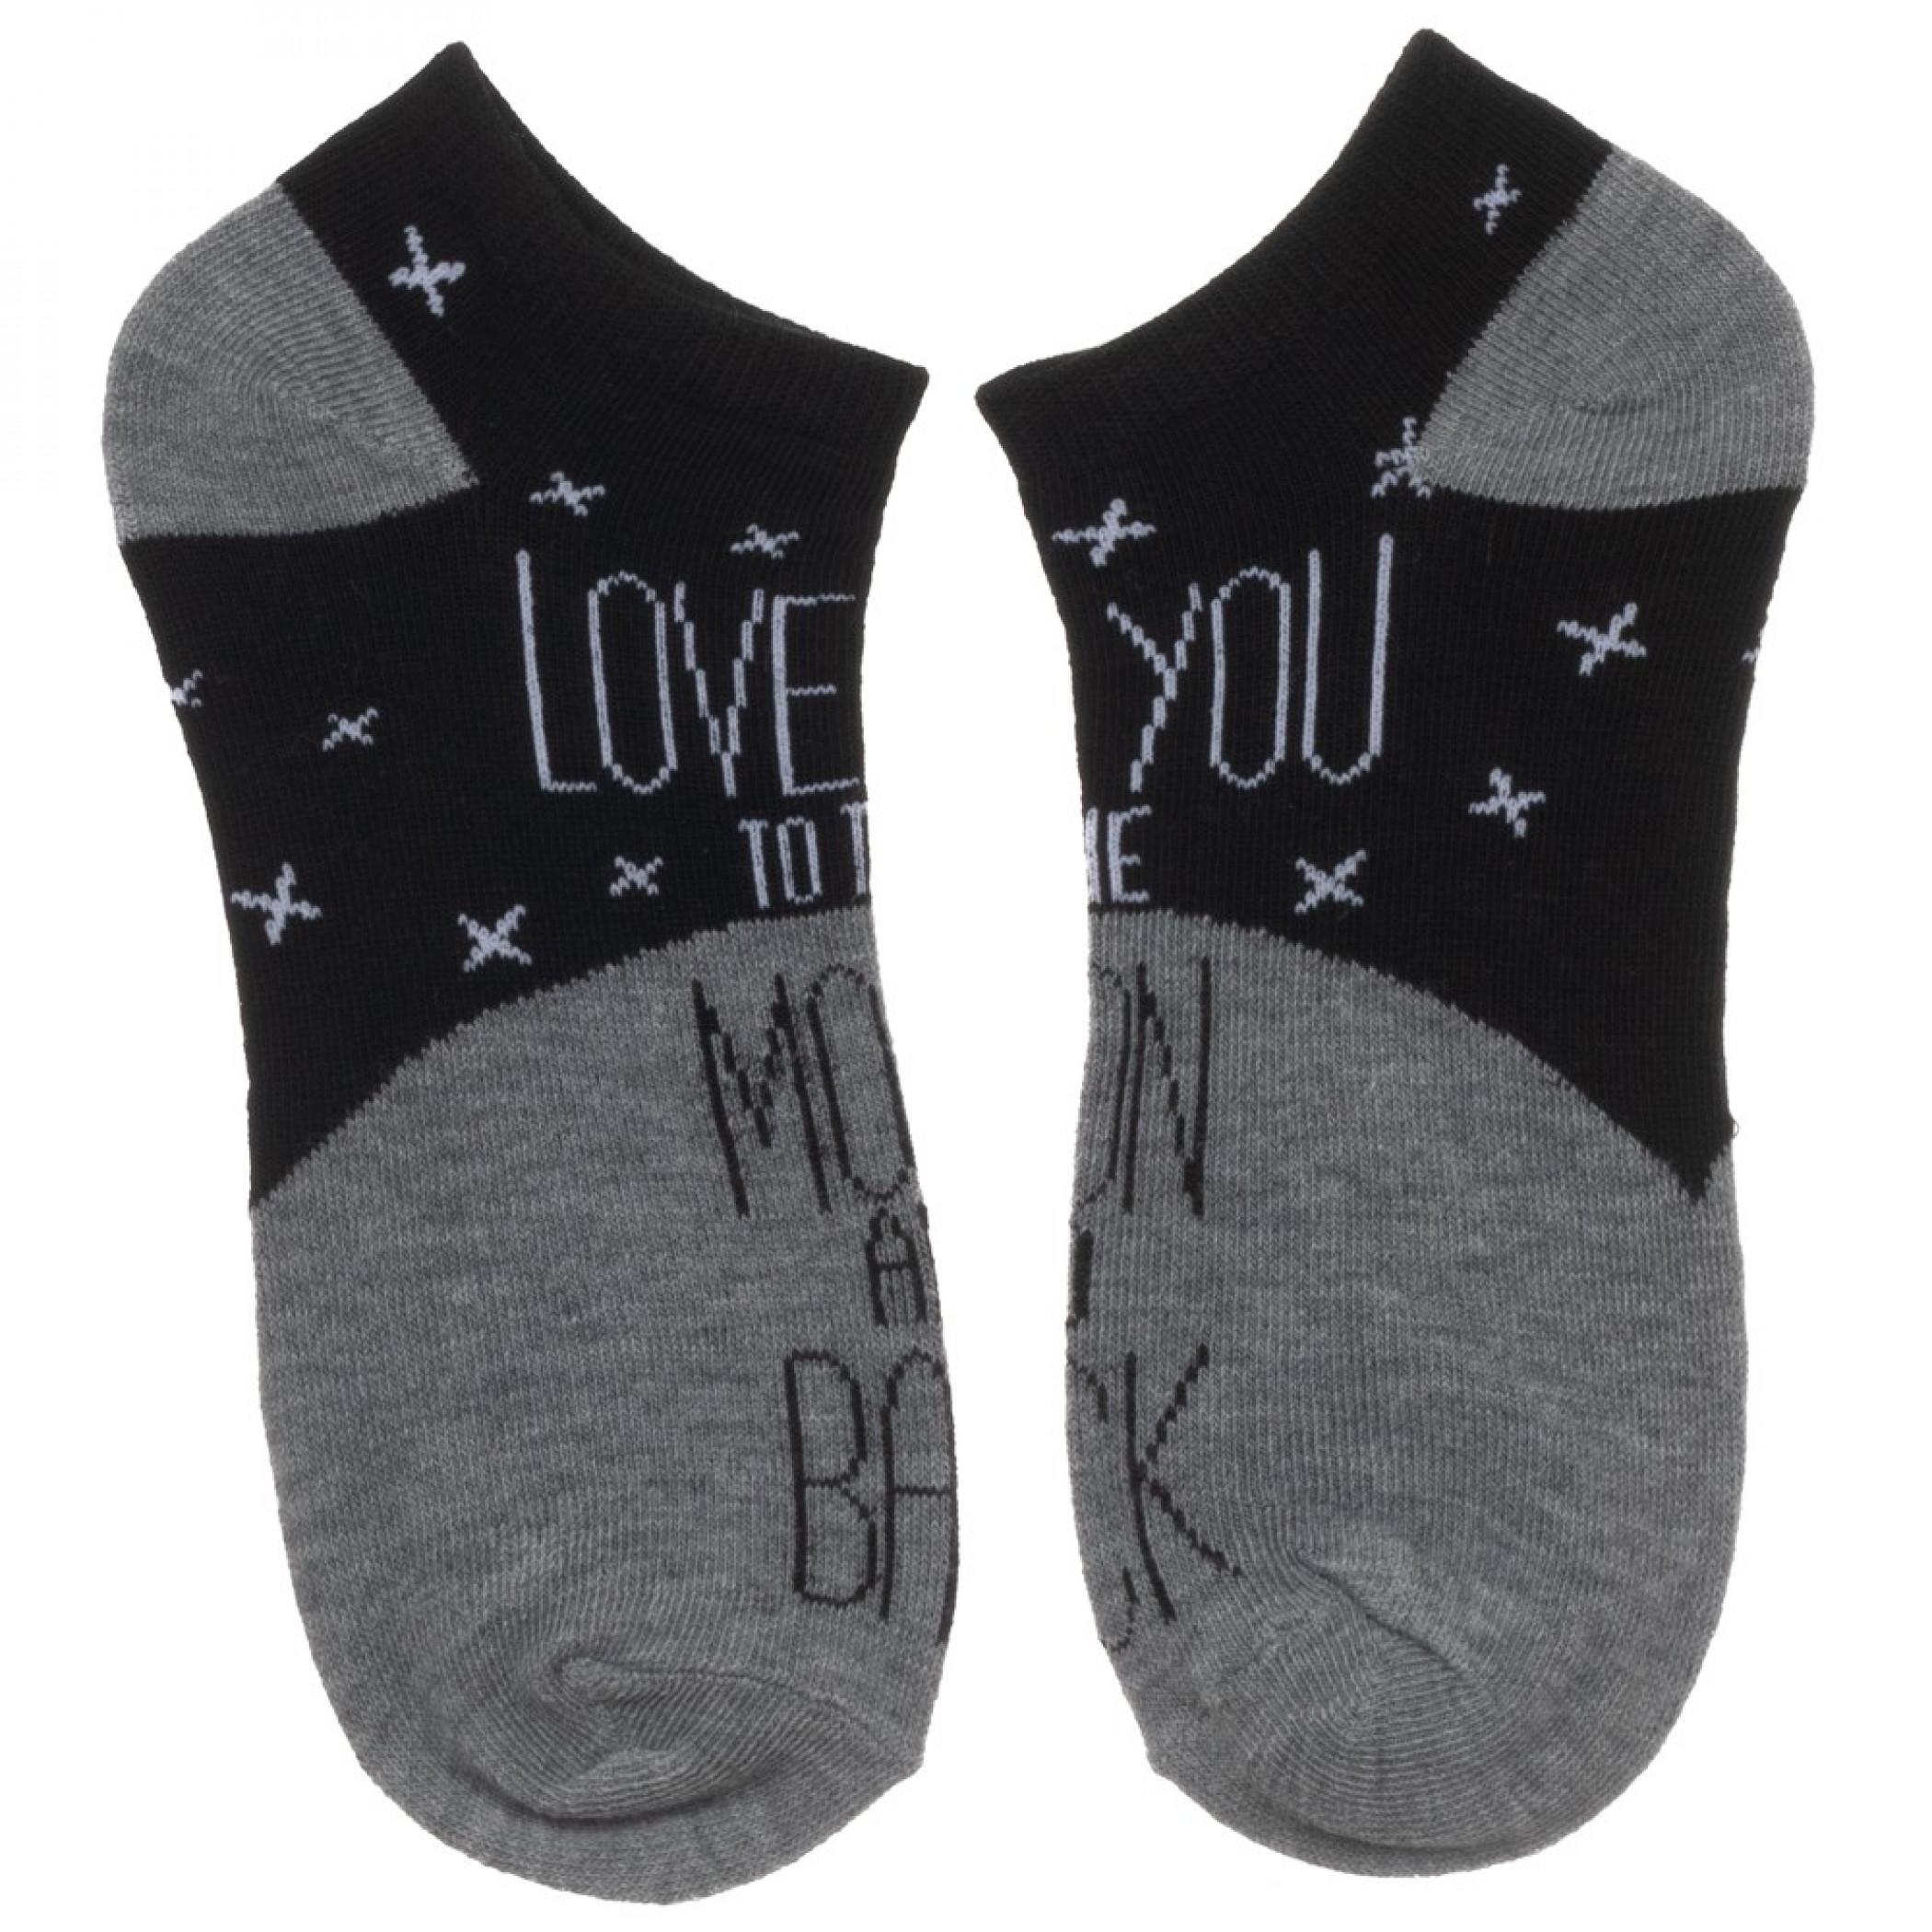 NASA 5-Pair Pack Junior Ankle Socks